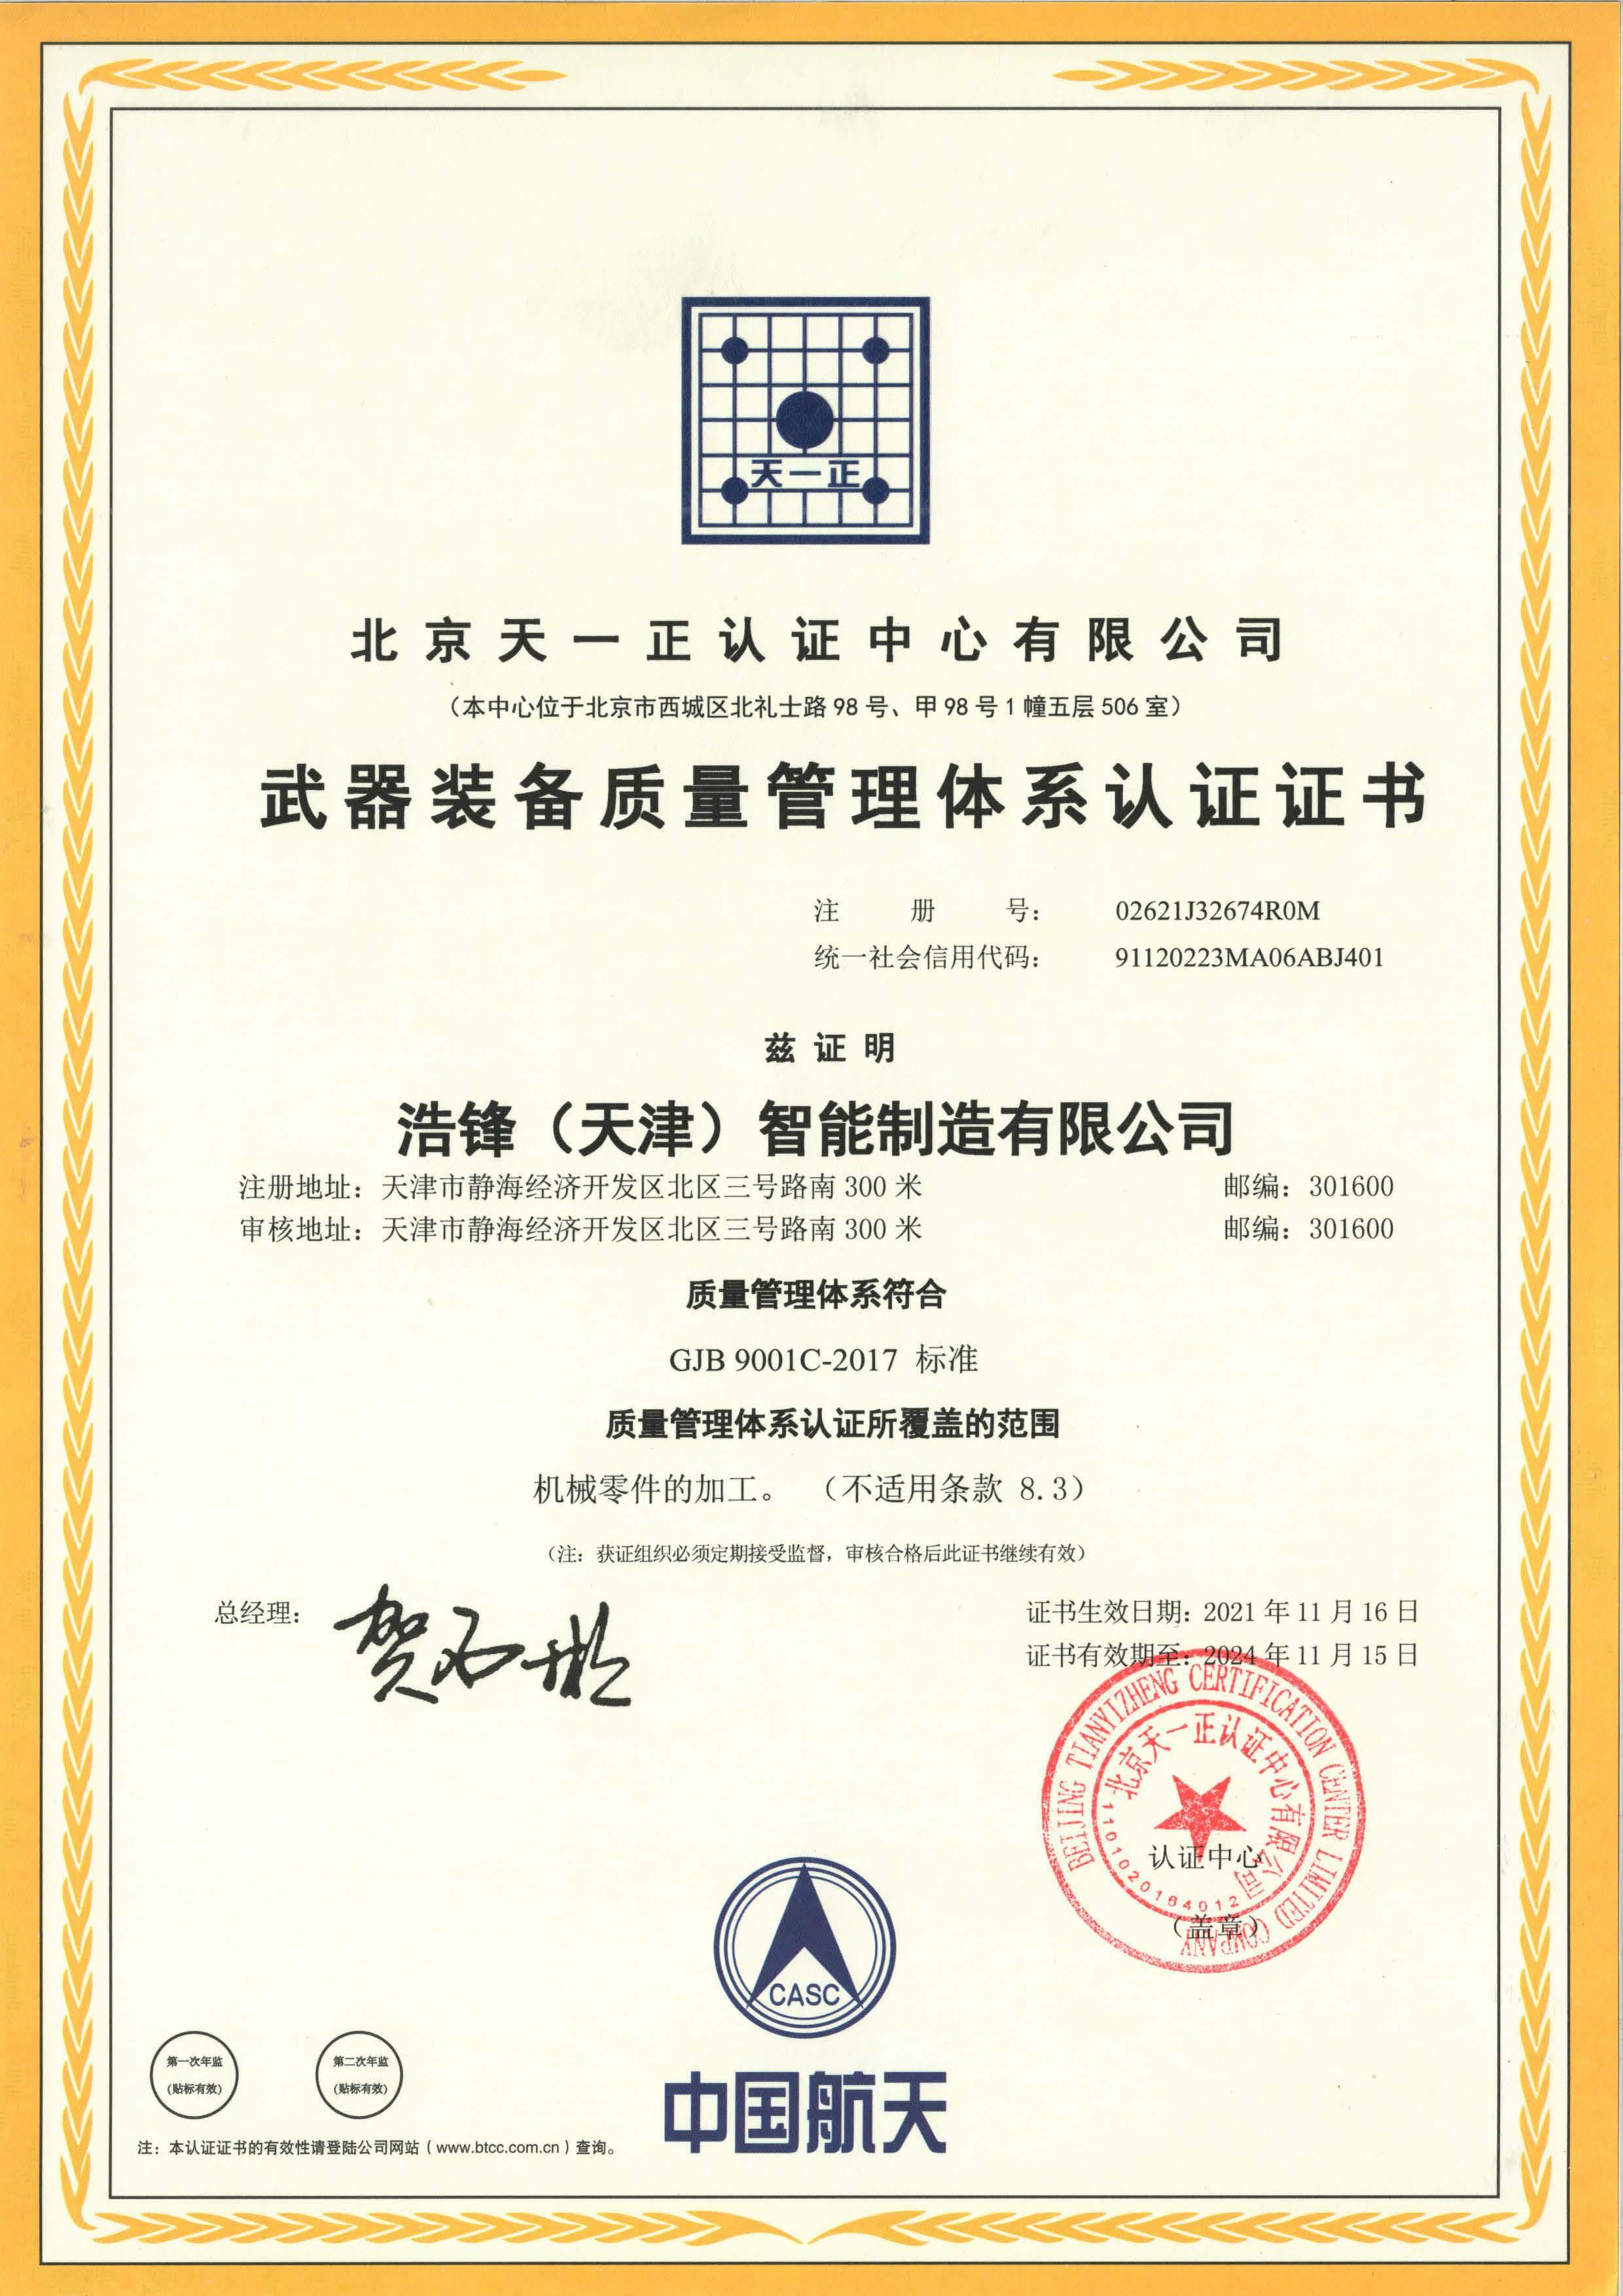 UKAS 浩锋ISO9001管理体系证书-中文